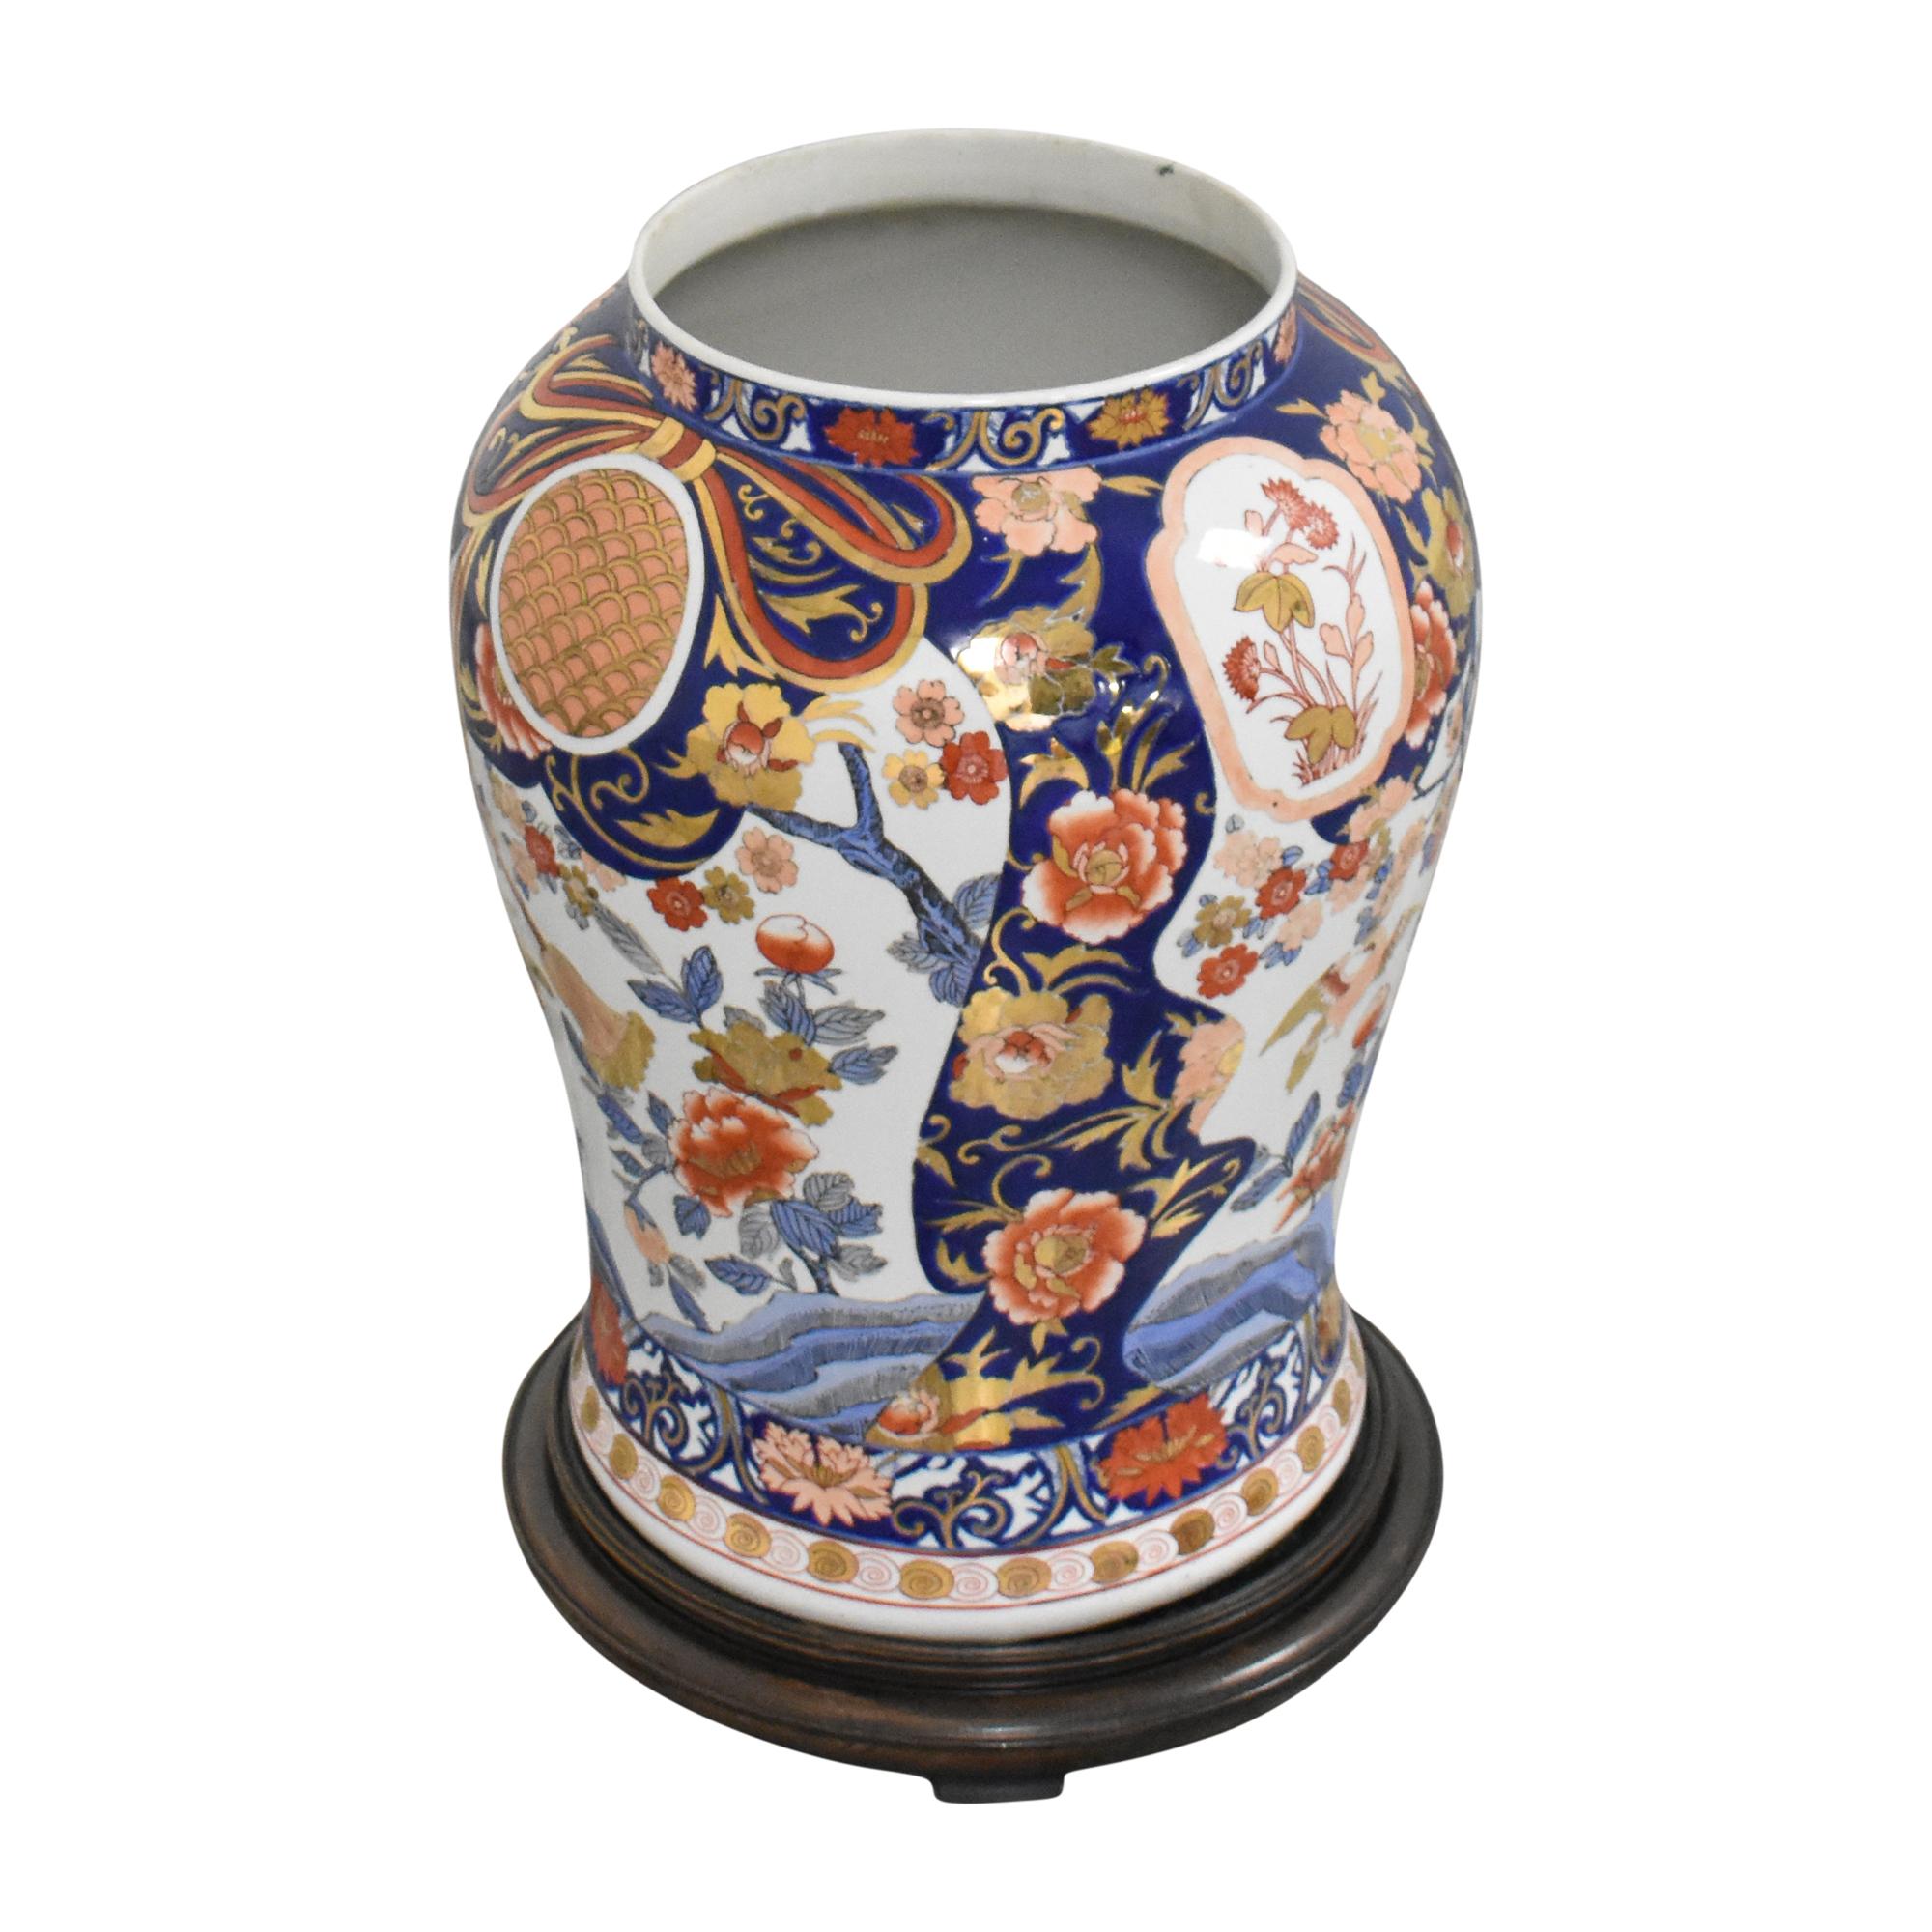 Maitland-Smith Maitland-Smith Decorative Vase price